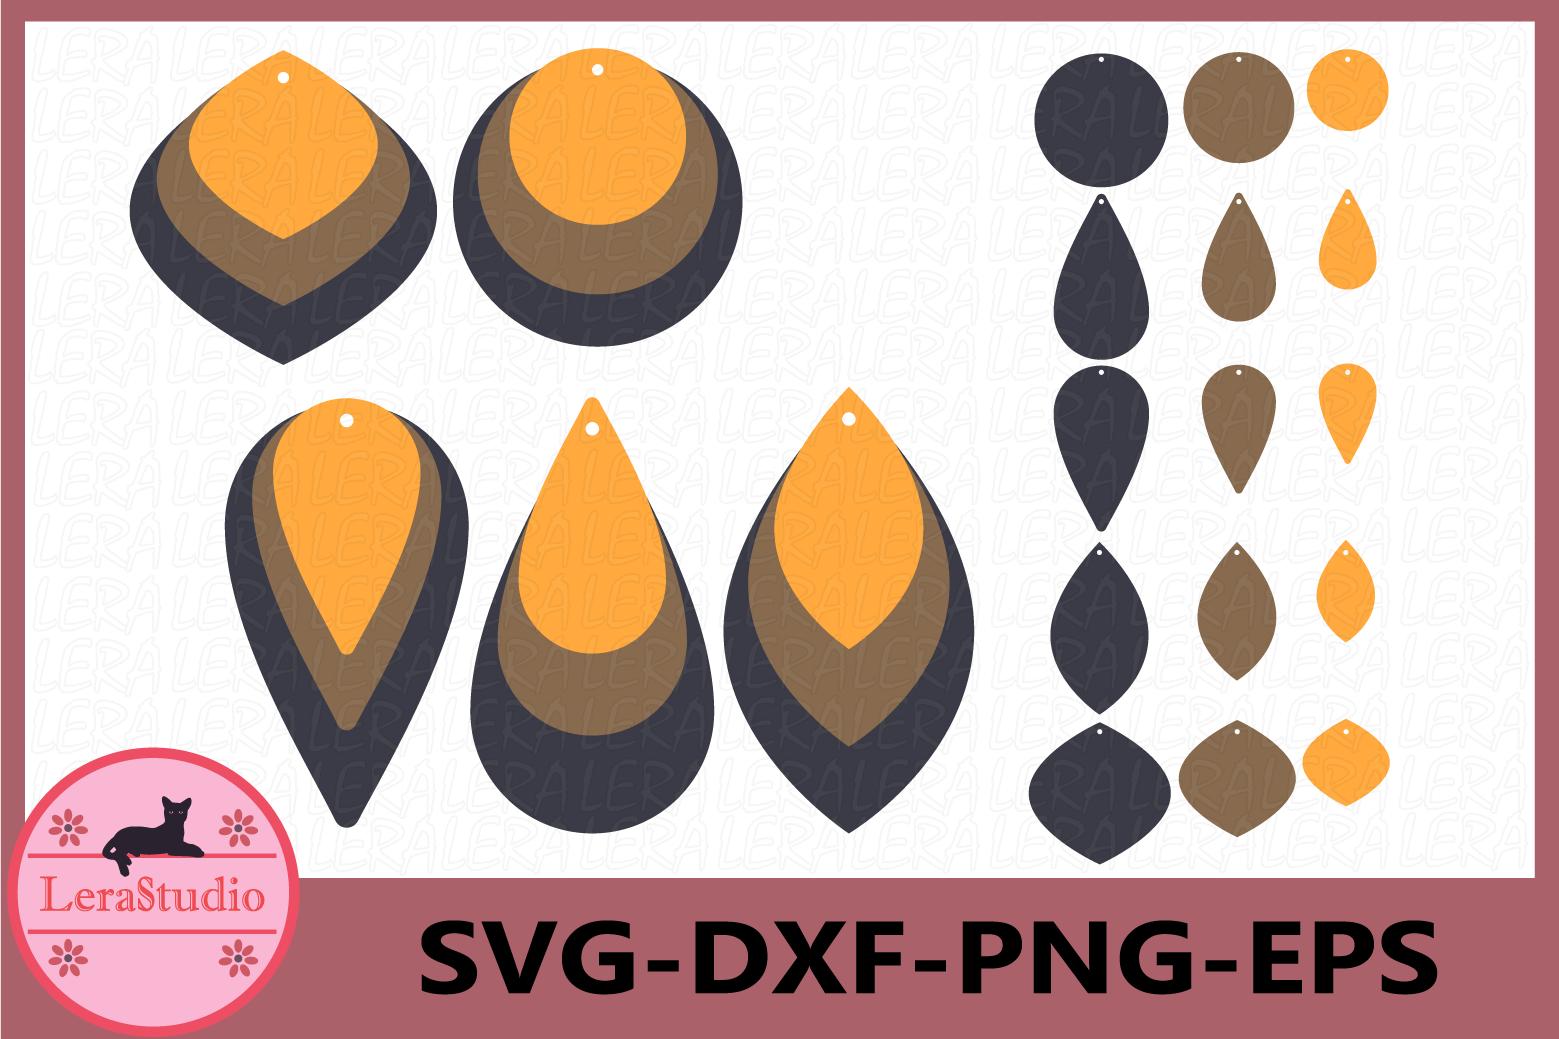 Leather Earrings Svg, Earrings SVG, Teardrop Earrings example image 1